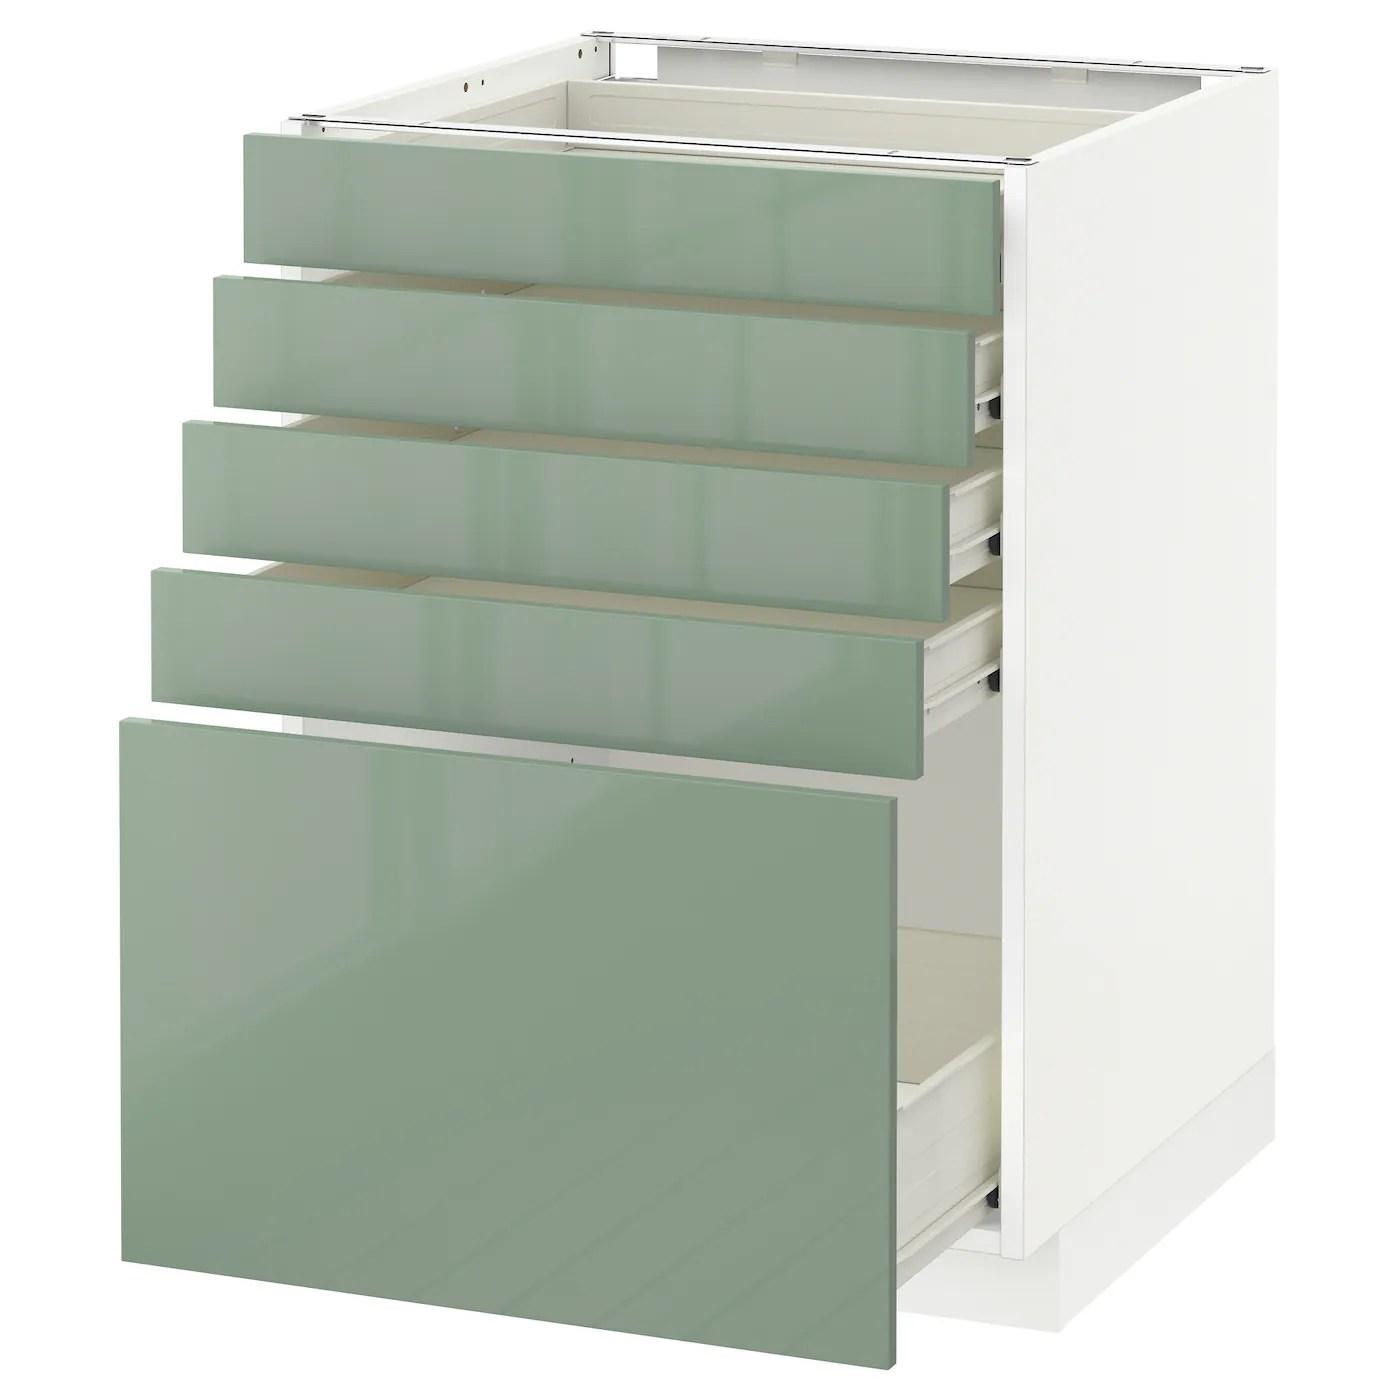 5 drawer kitchen base cabinet countertops options metod fÖrvara with drawers white kallarp